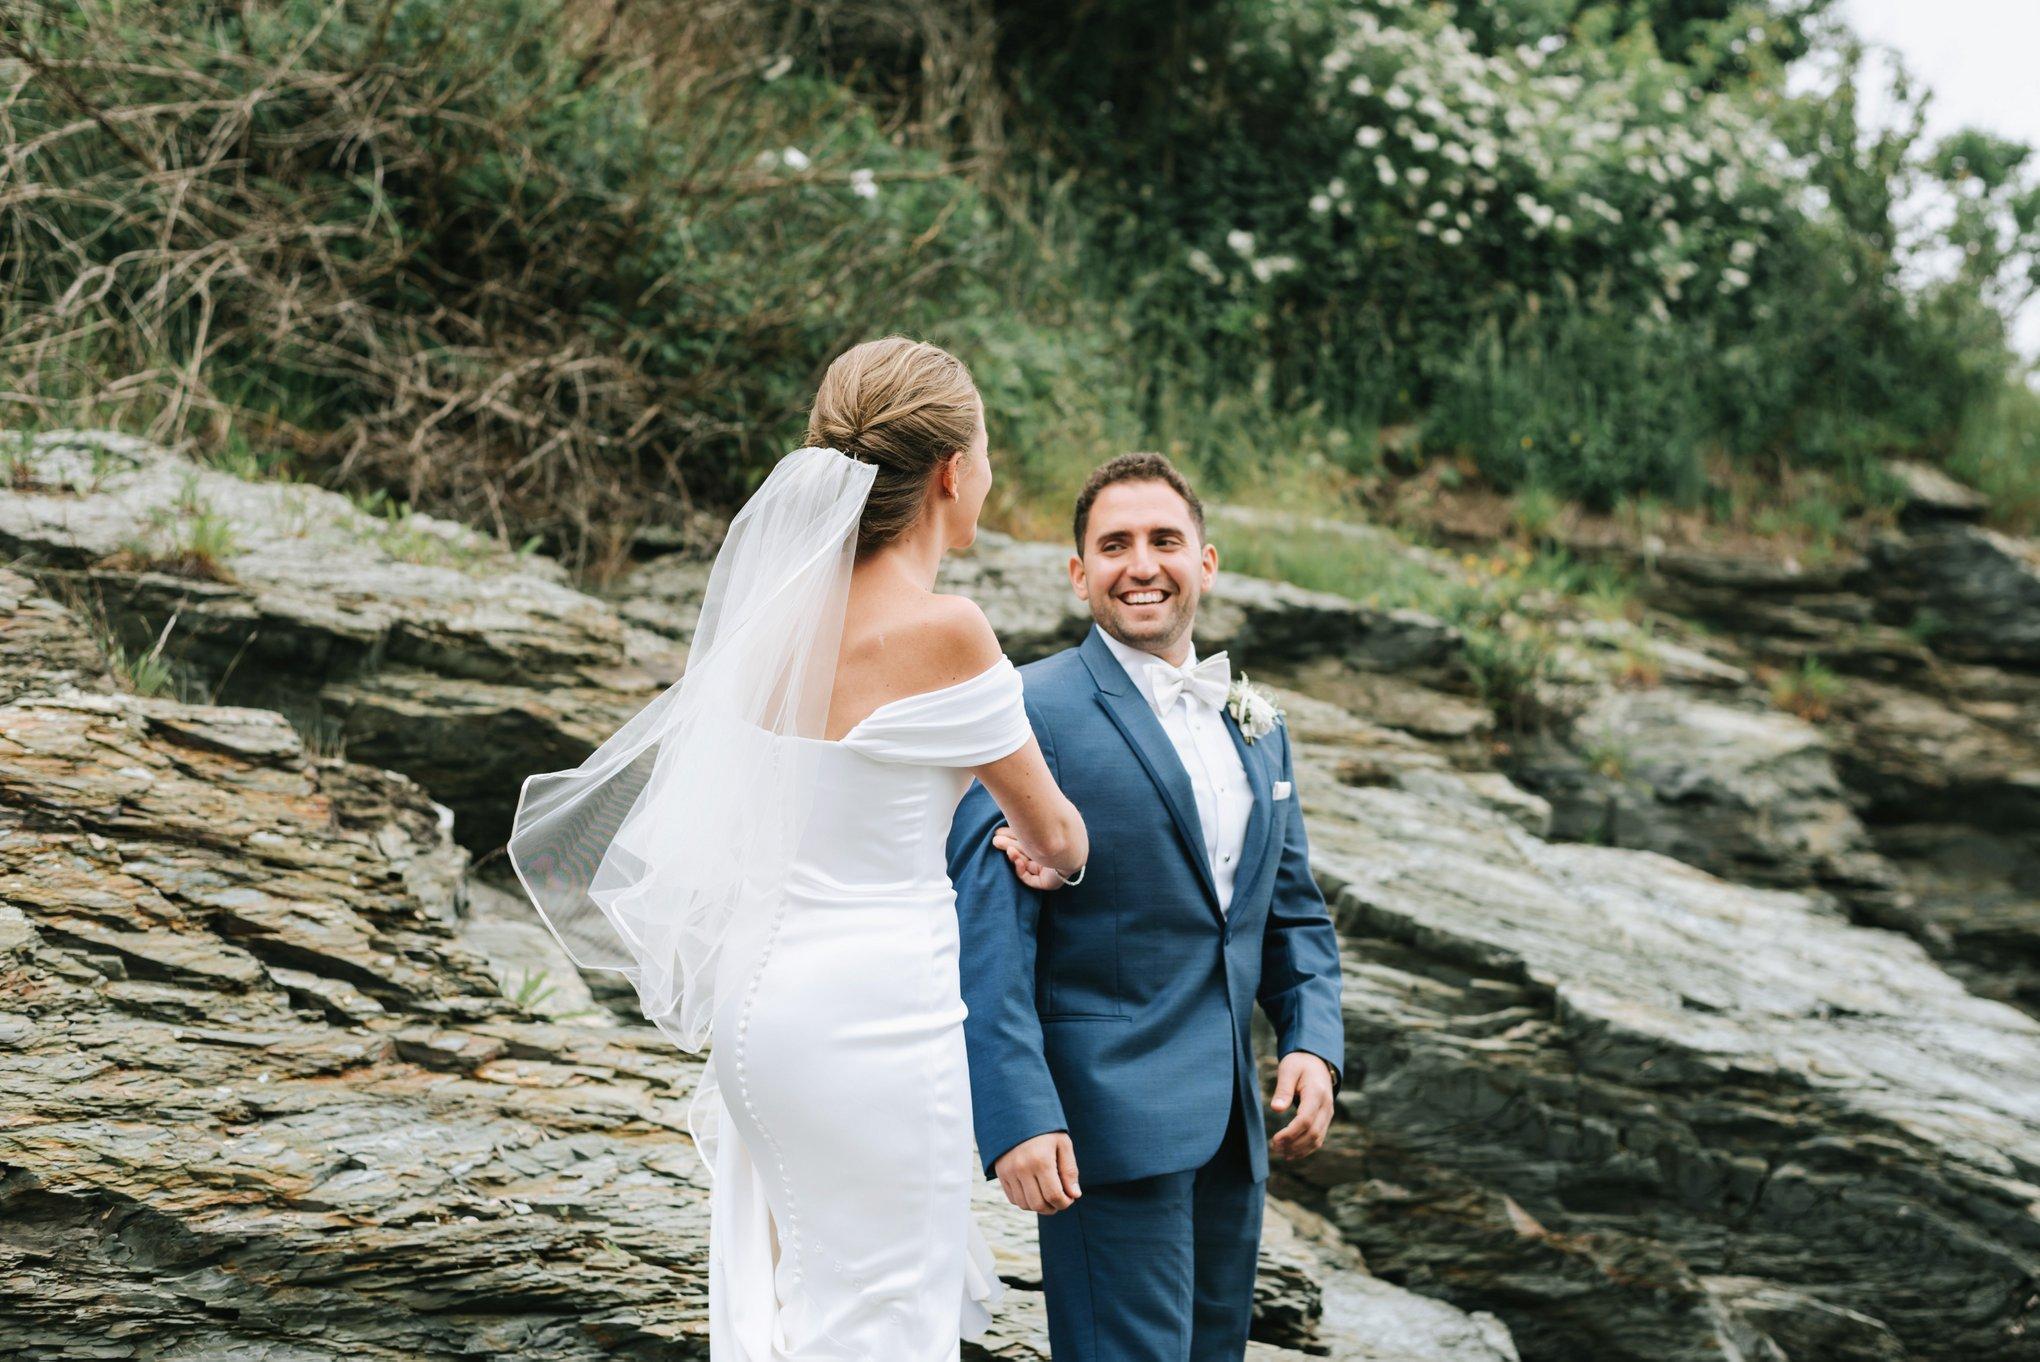 Castle-Hill-Inn-Newport-Wedding-14.jpg